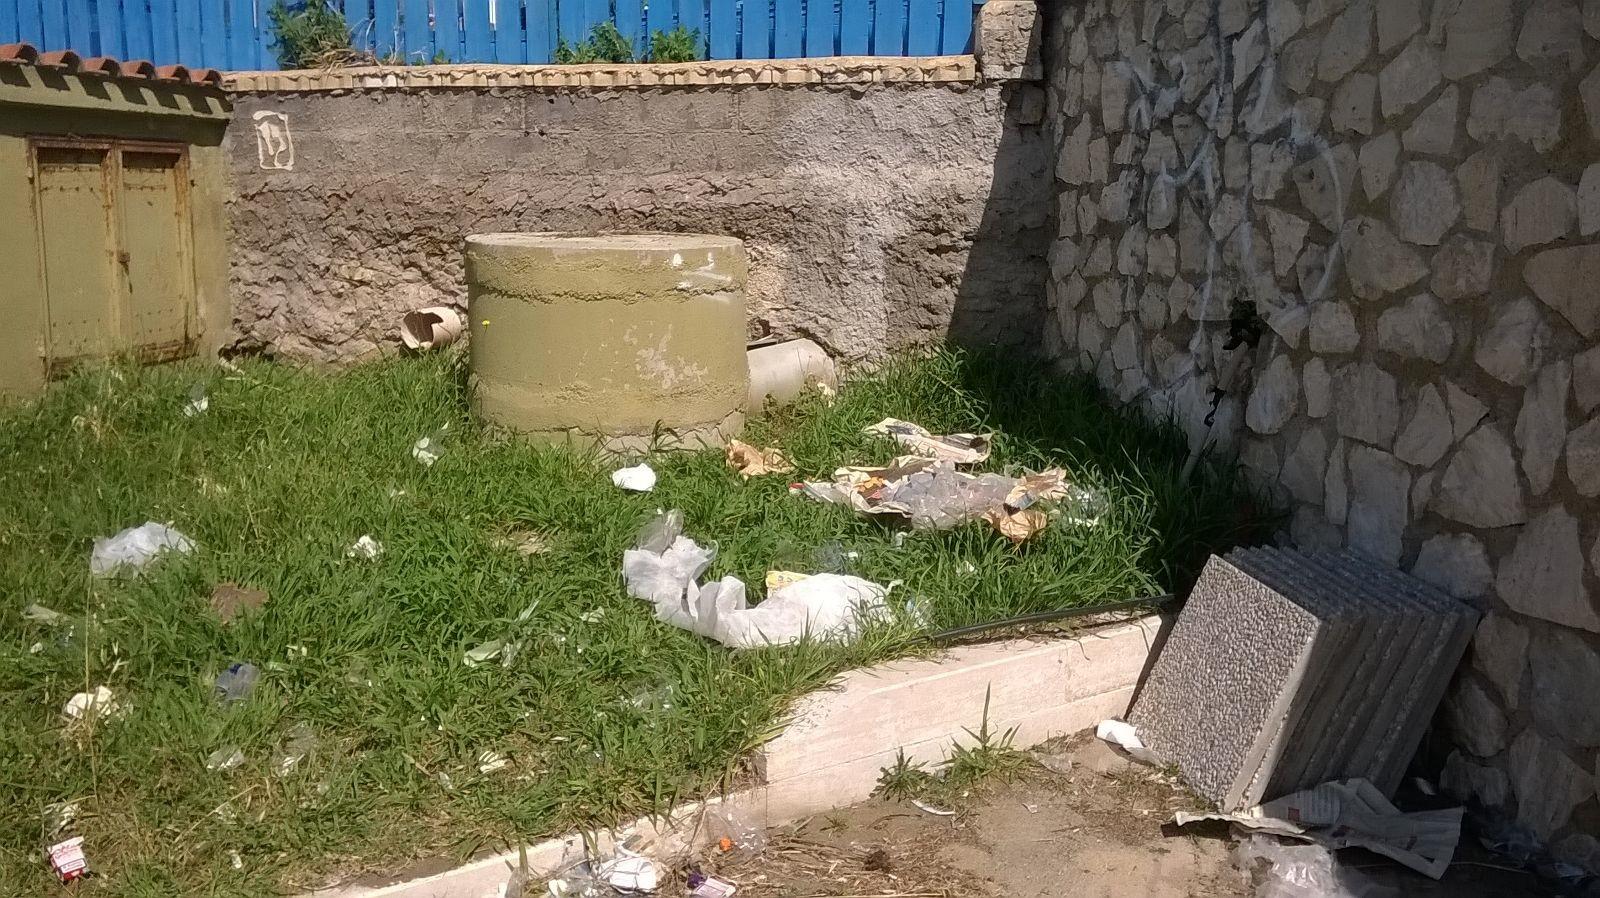 viale spazzatura dopo street food